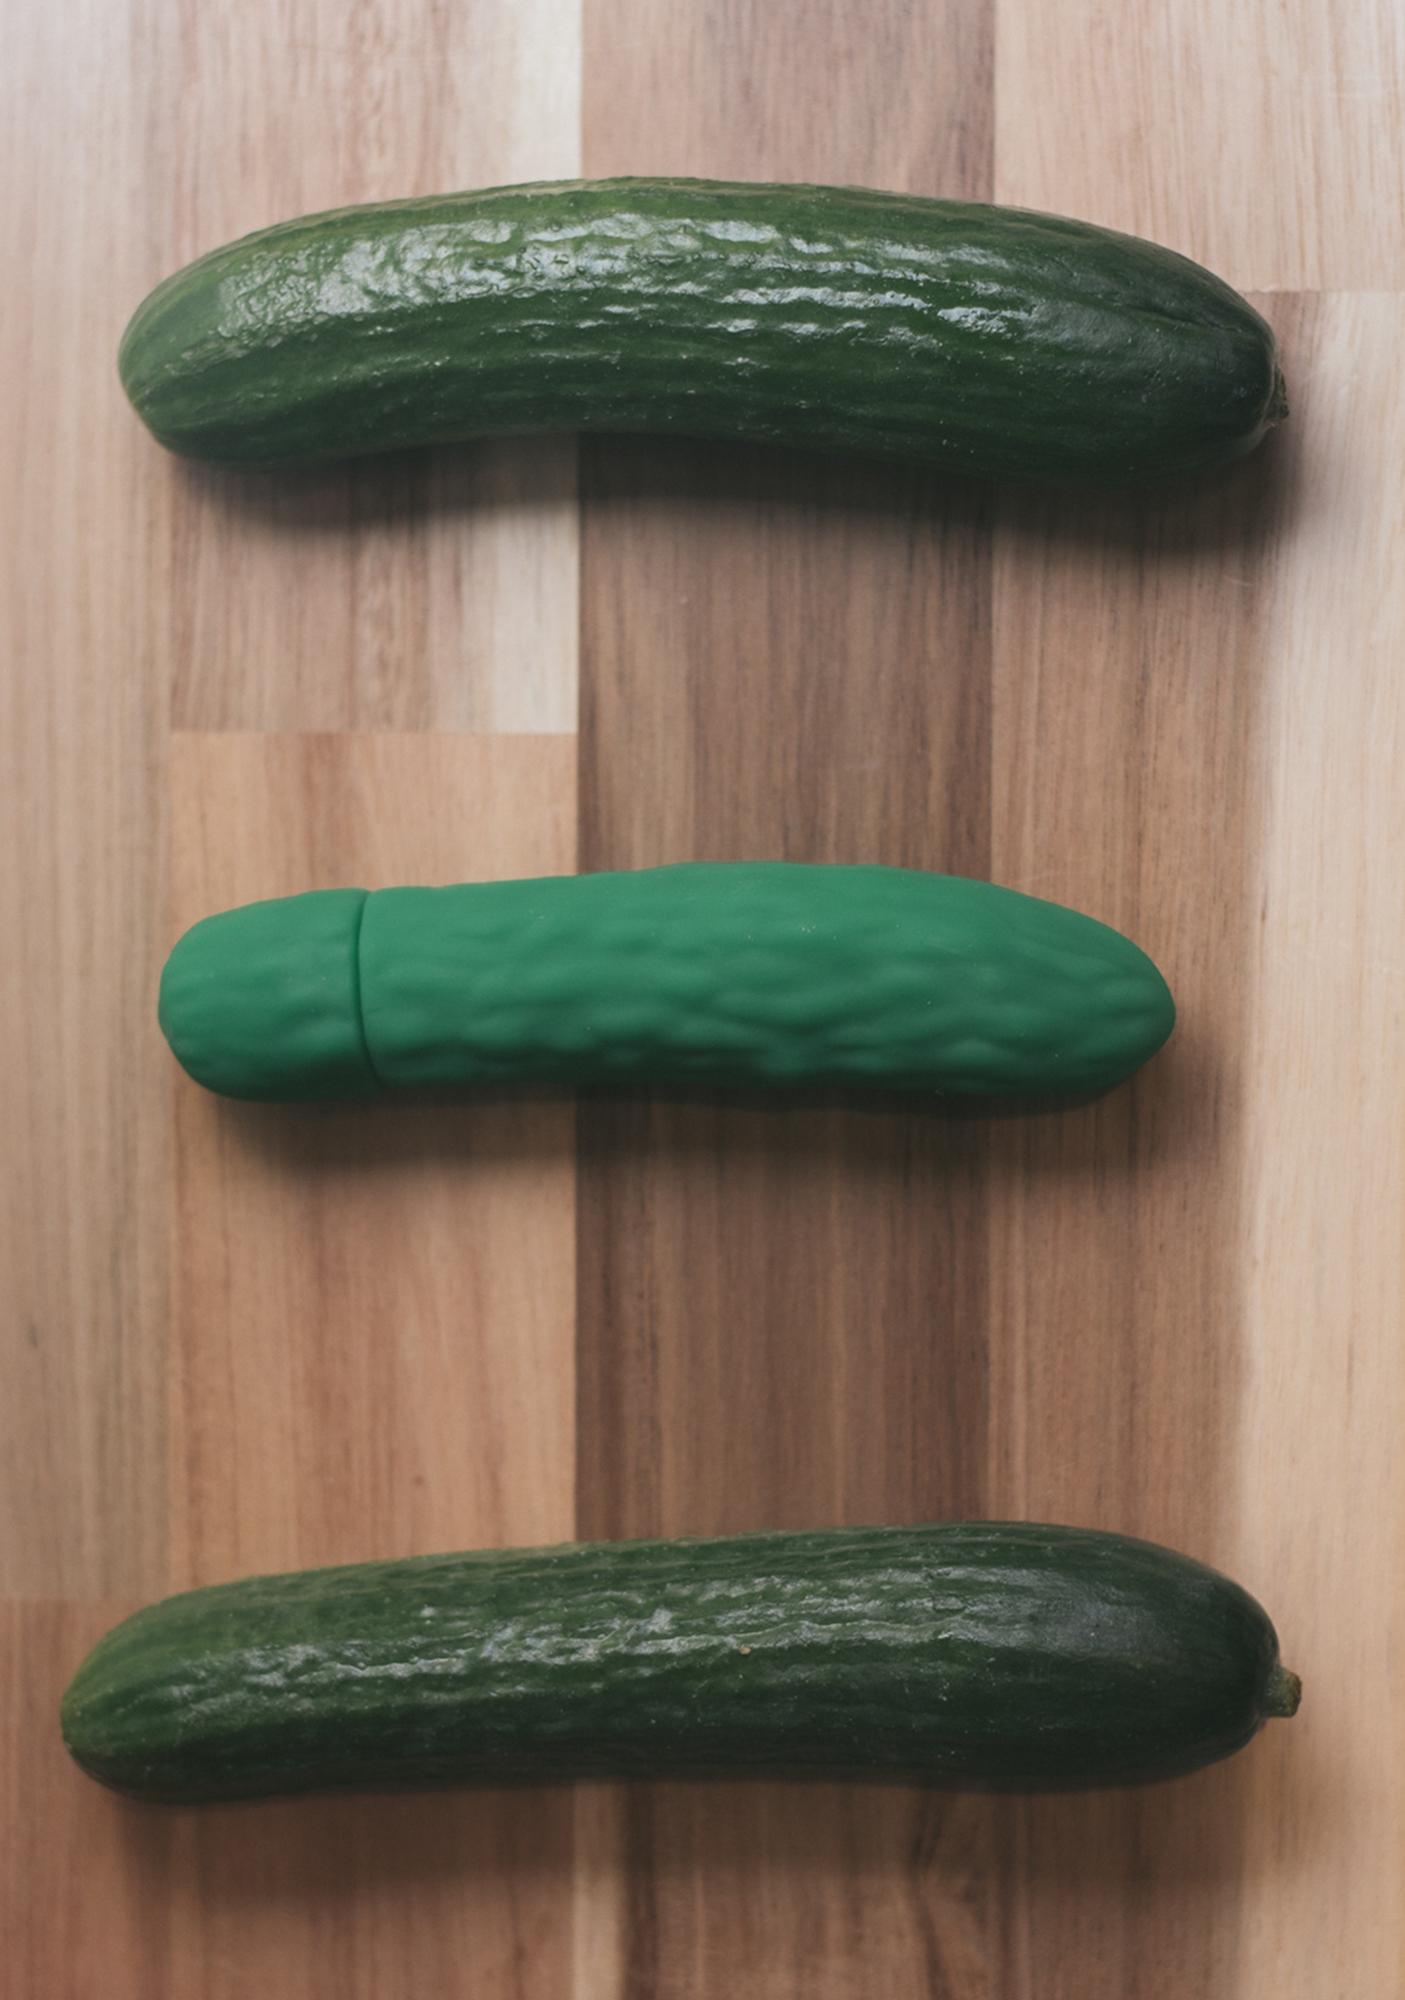 Emojibator The Pickle Emojibator Vibrator